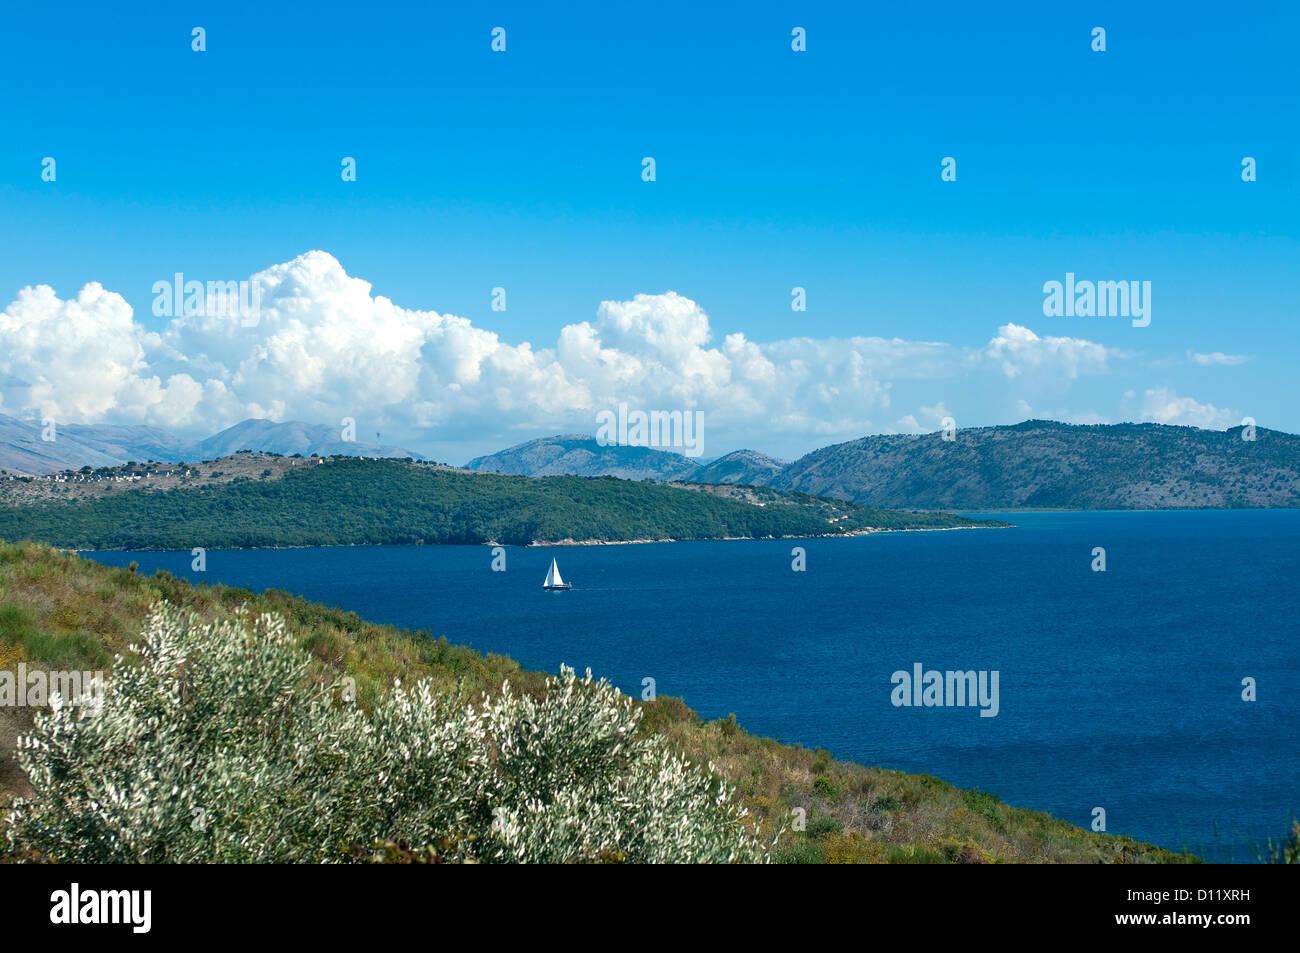 Agios Stefanos Bay view, Corfu, Ionian Islands, Greece - Stock Image